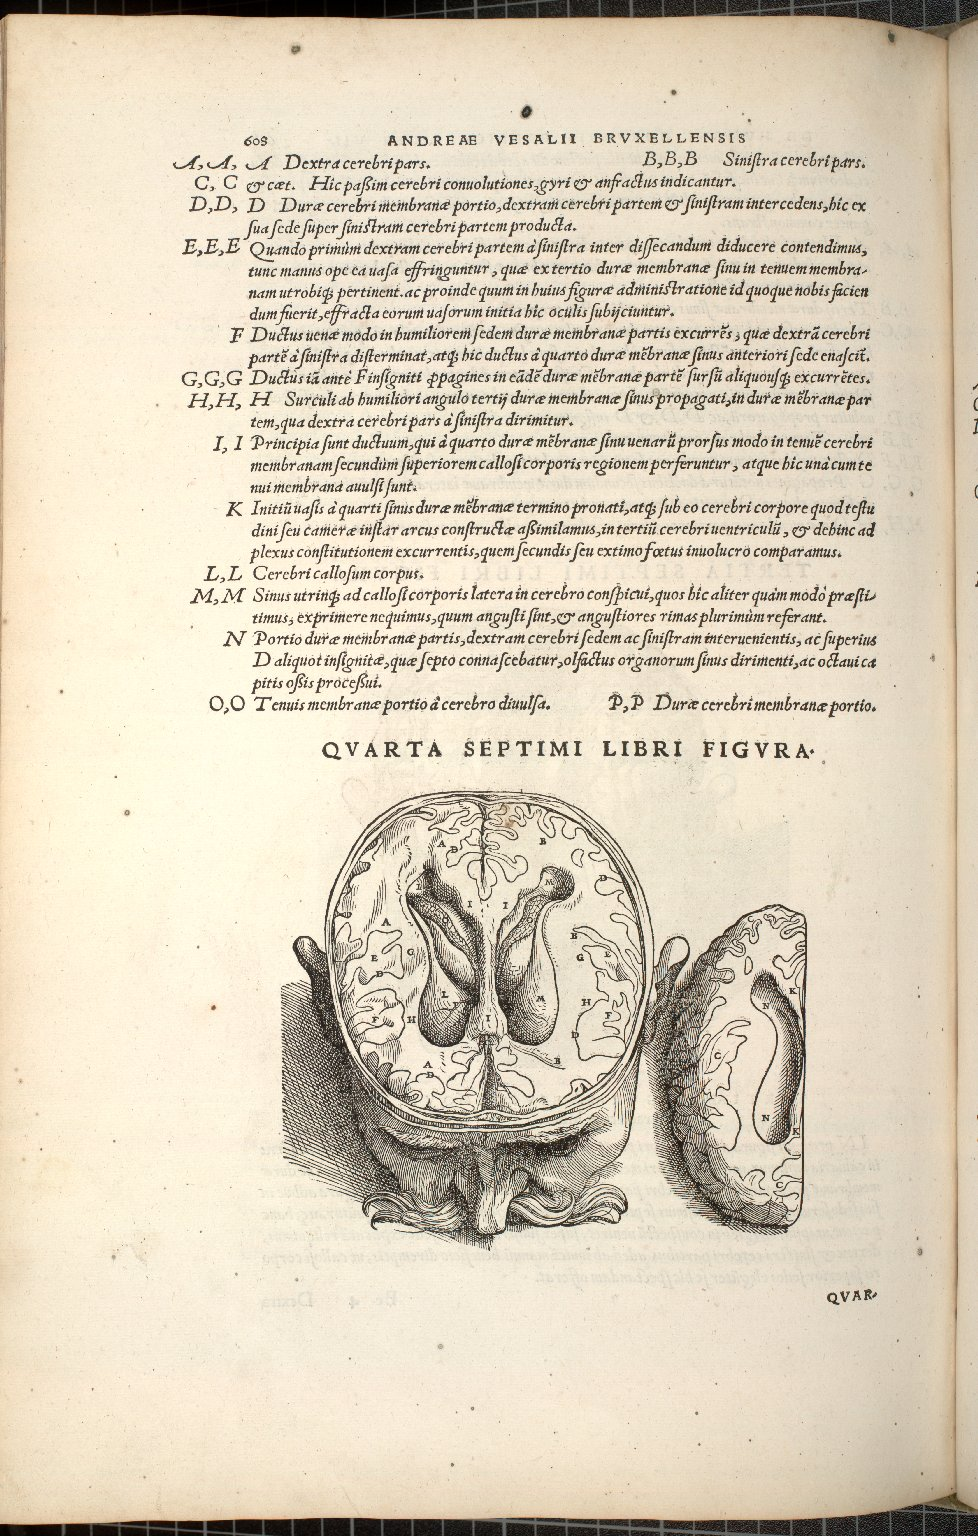 Quarta Septimi Libri Figura